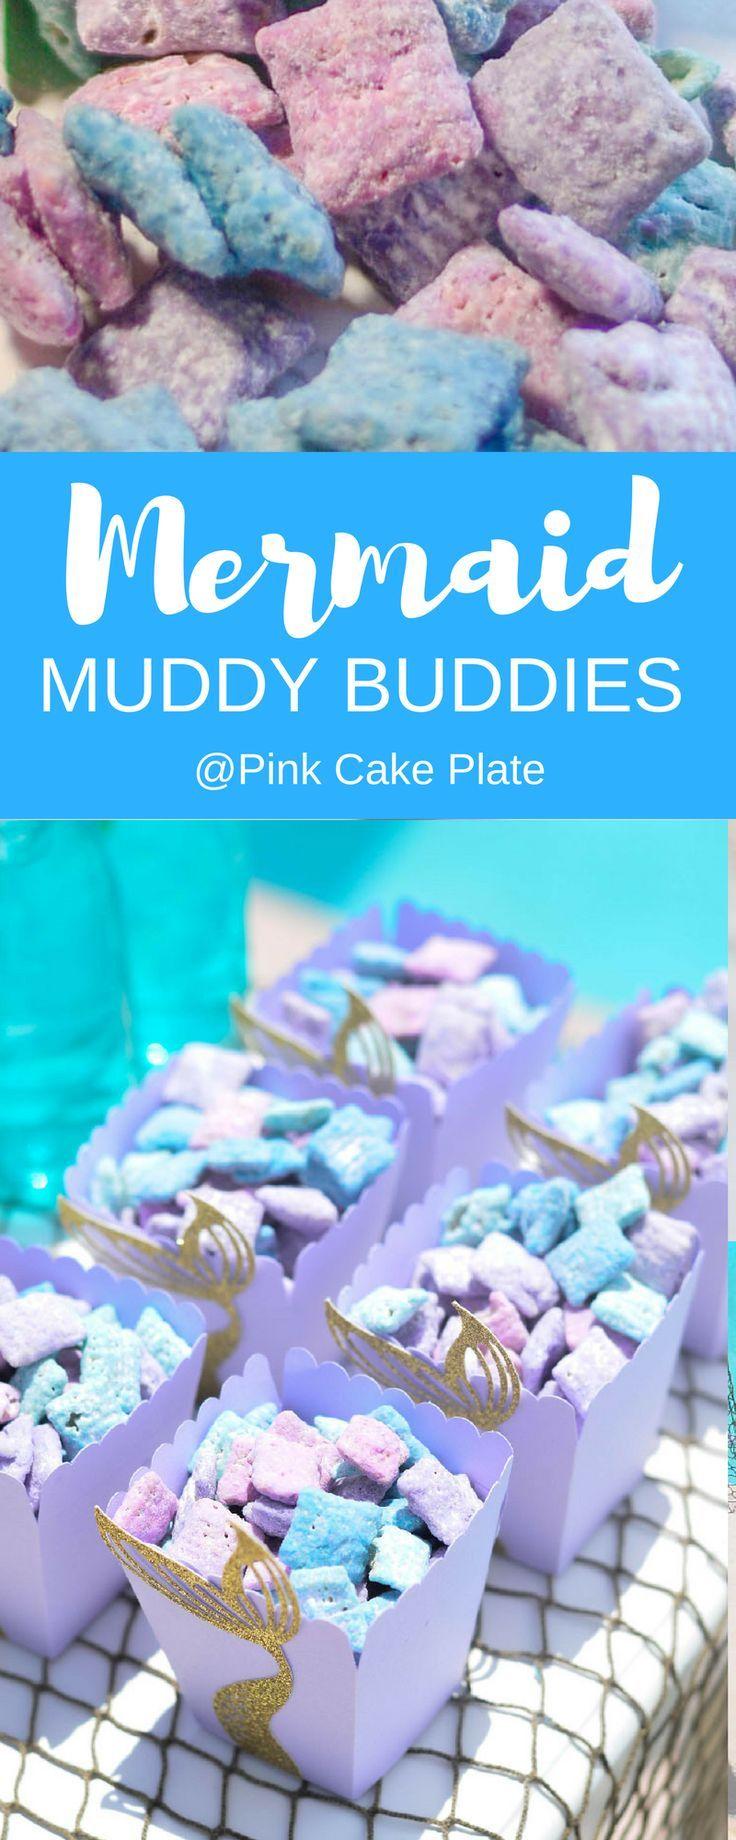 Mermaid Muddy Buddies - Pink Cake Plate